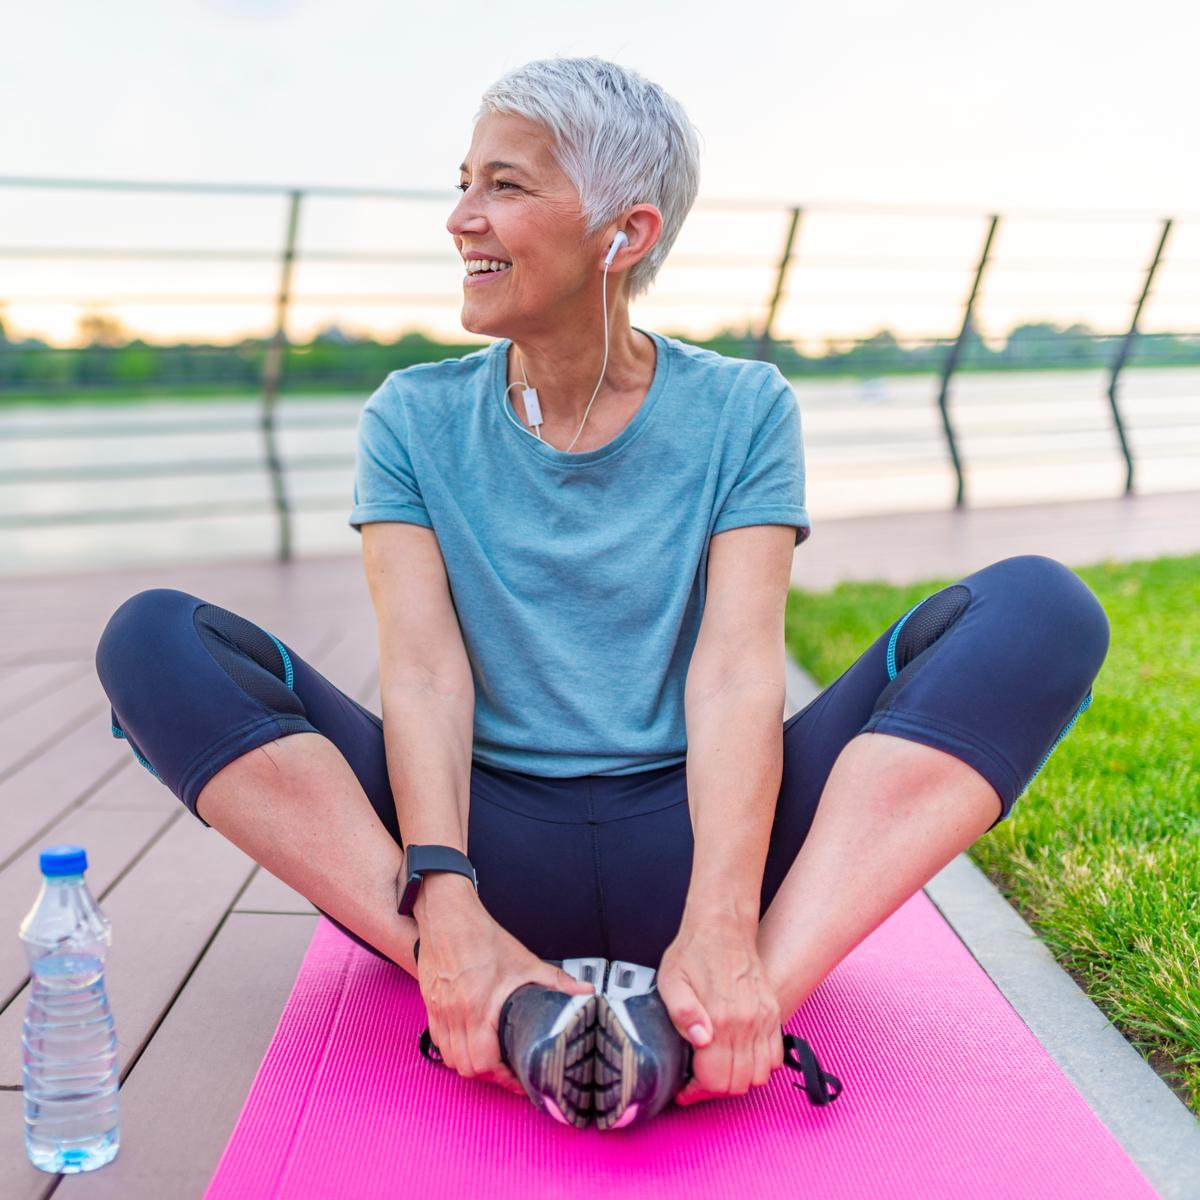 Can Anti-Aging Facial Exercises Work?